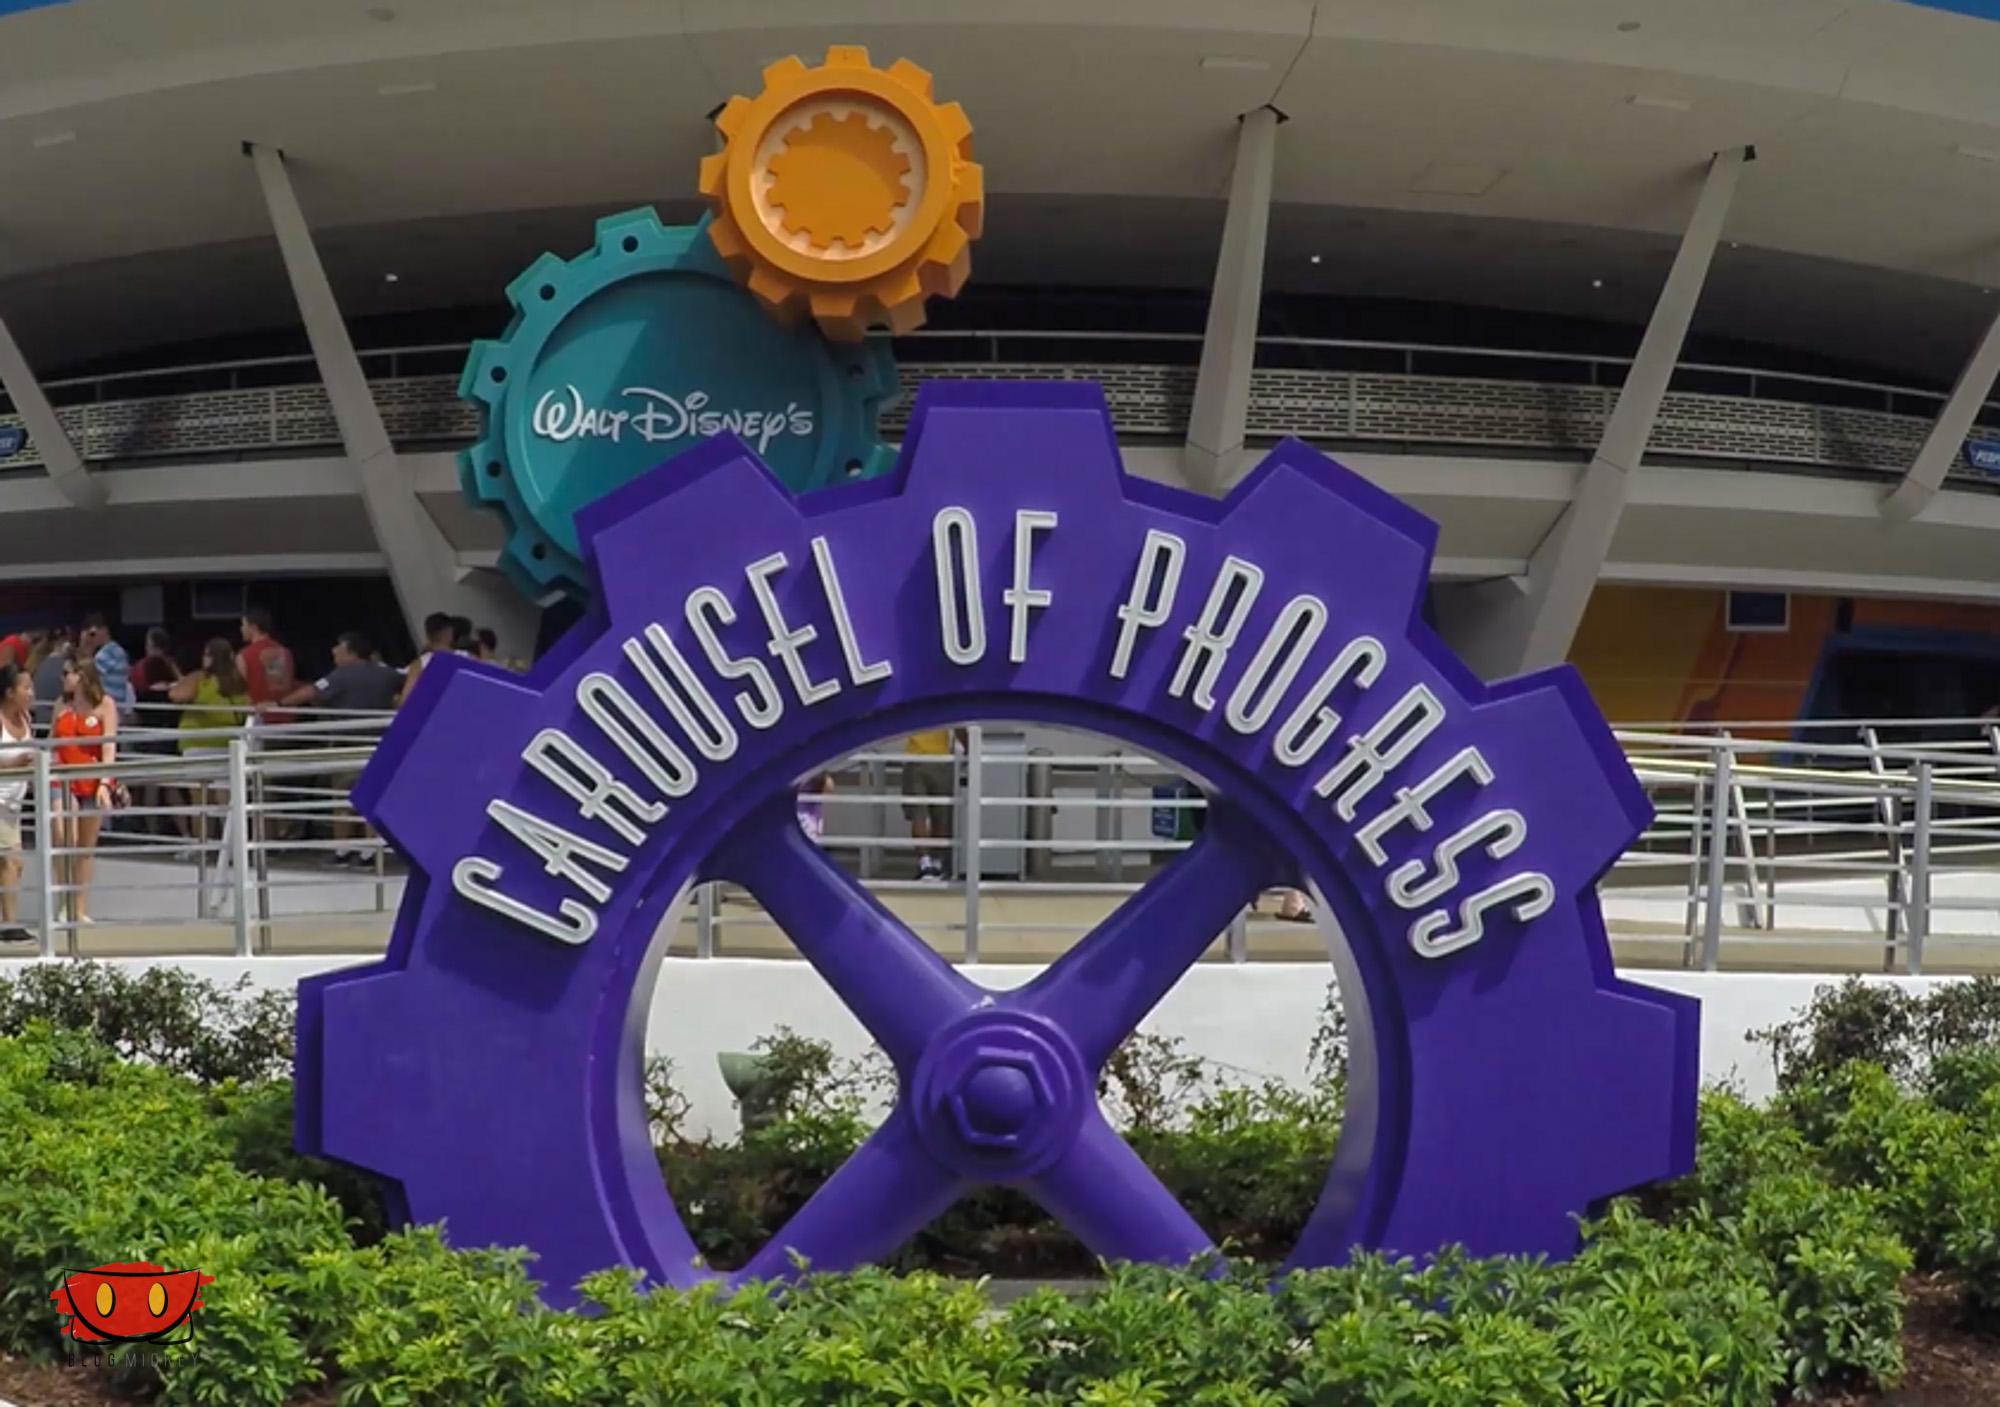 CarouselOfProgress-sign-1